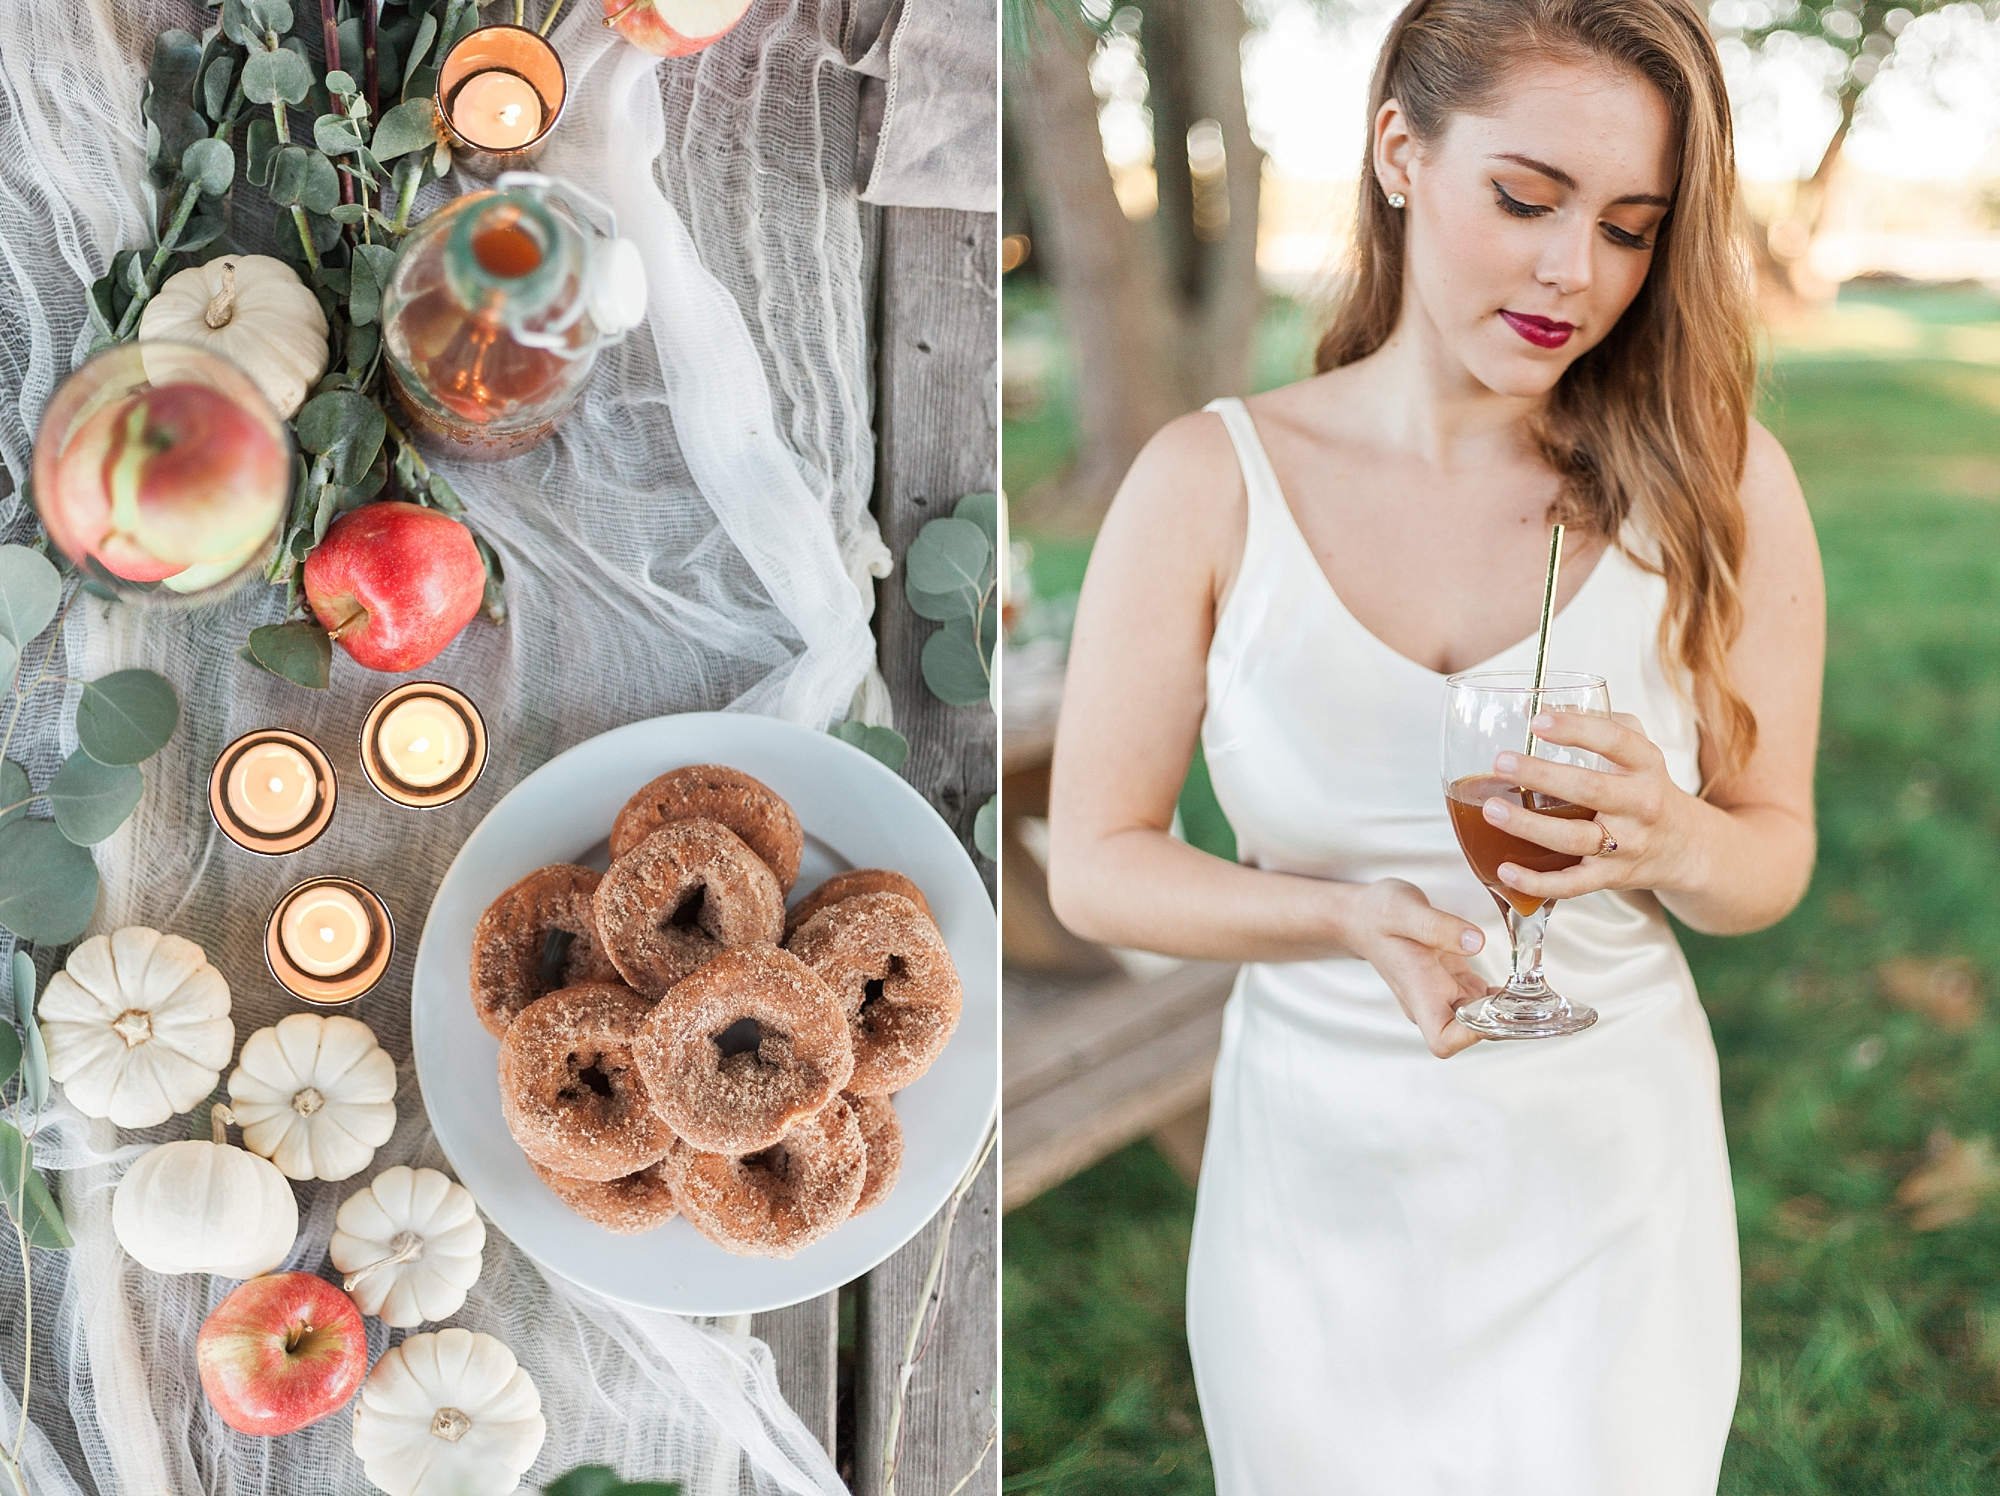 New Hampshire Fall Wedding | New England Fall Wedding | New Hampshire Wedding Photographer | Massachusetts Wedding Photographer | Madison Rae Photography